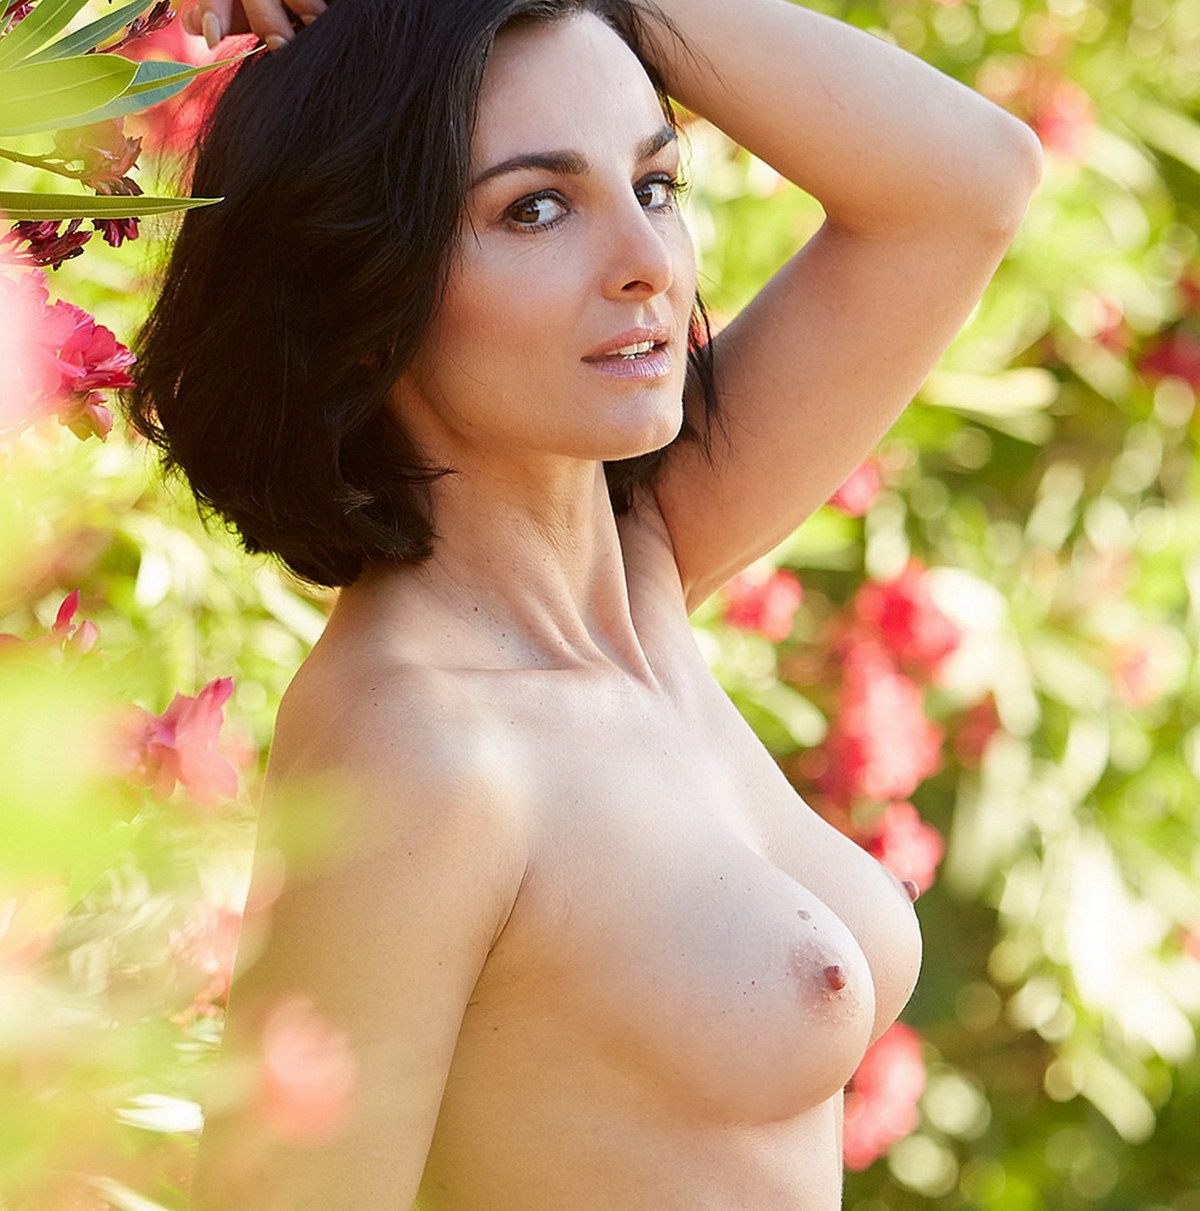 Nackt porn fiedler mimi Mimi Fiedler